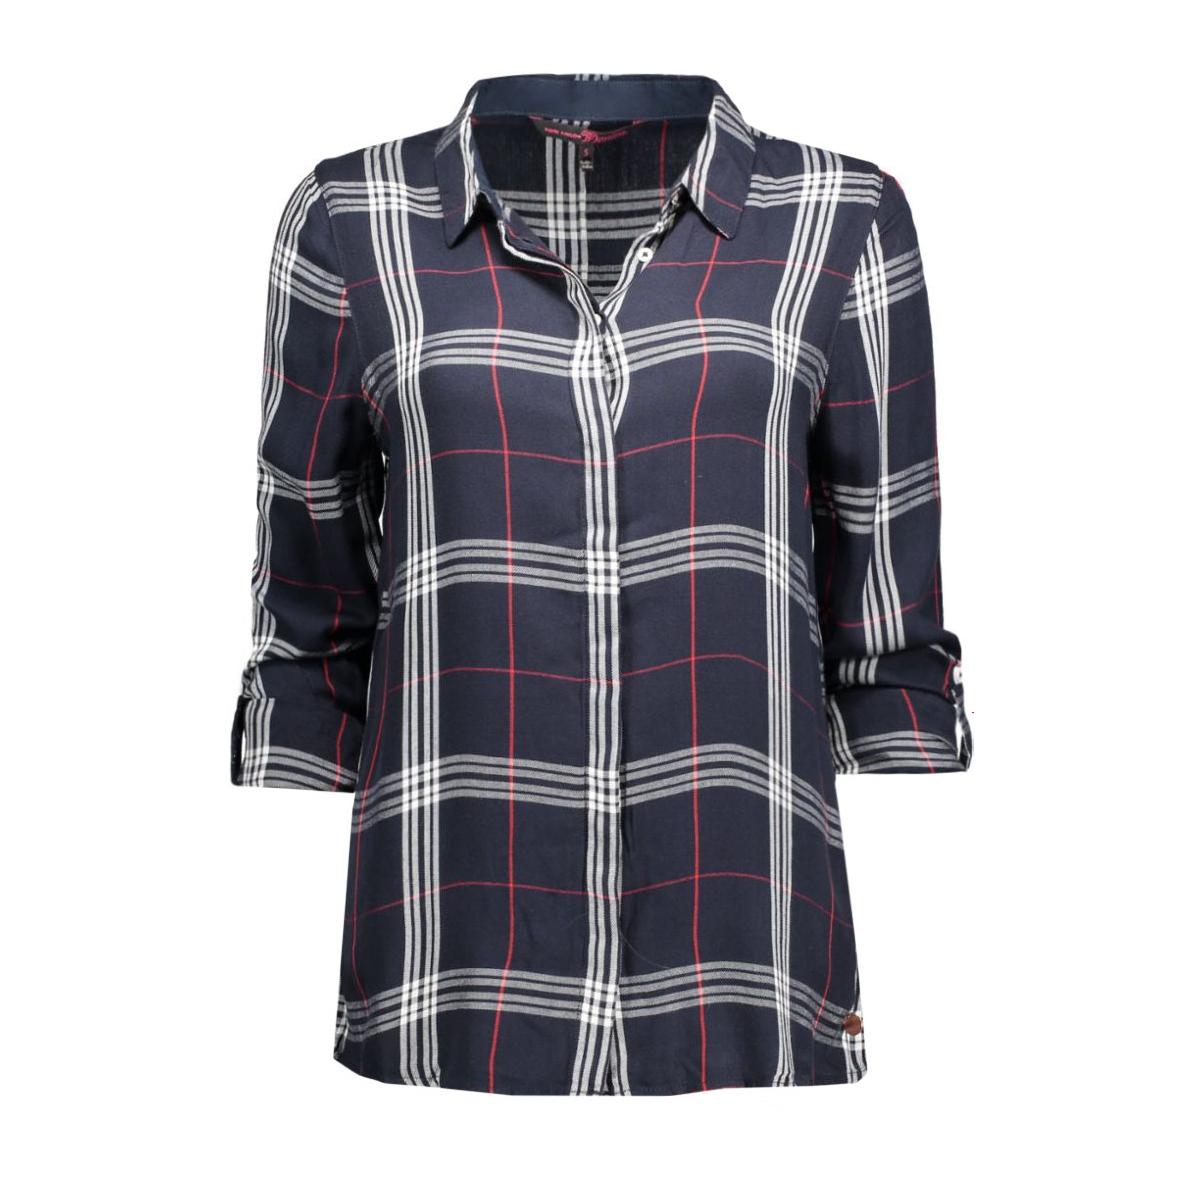 2032356.62.71 tom tailor blouse 6901